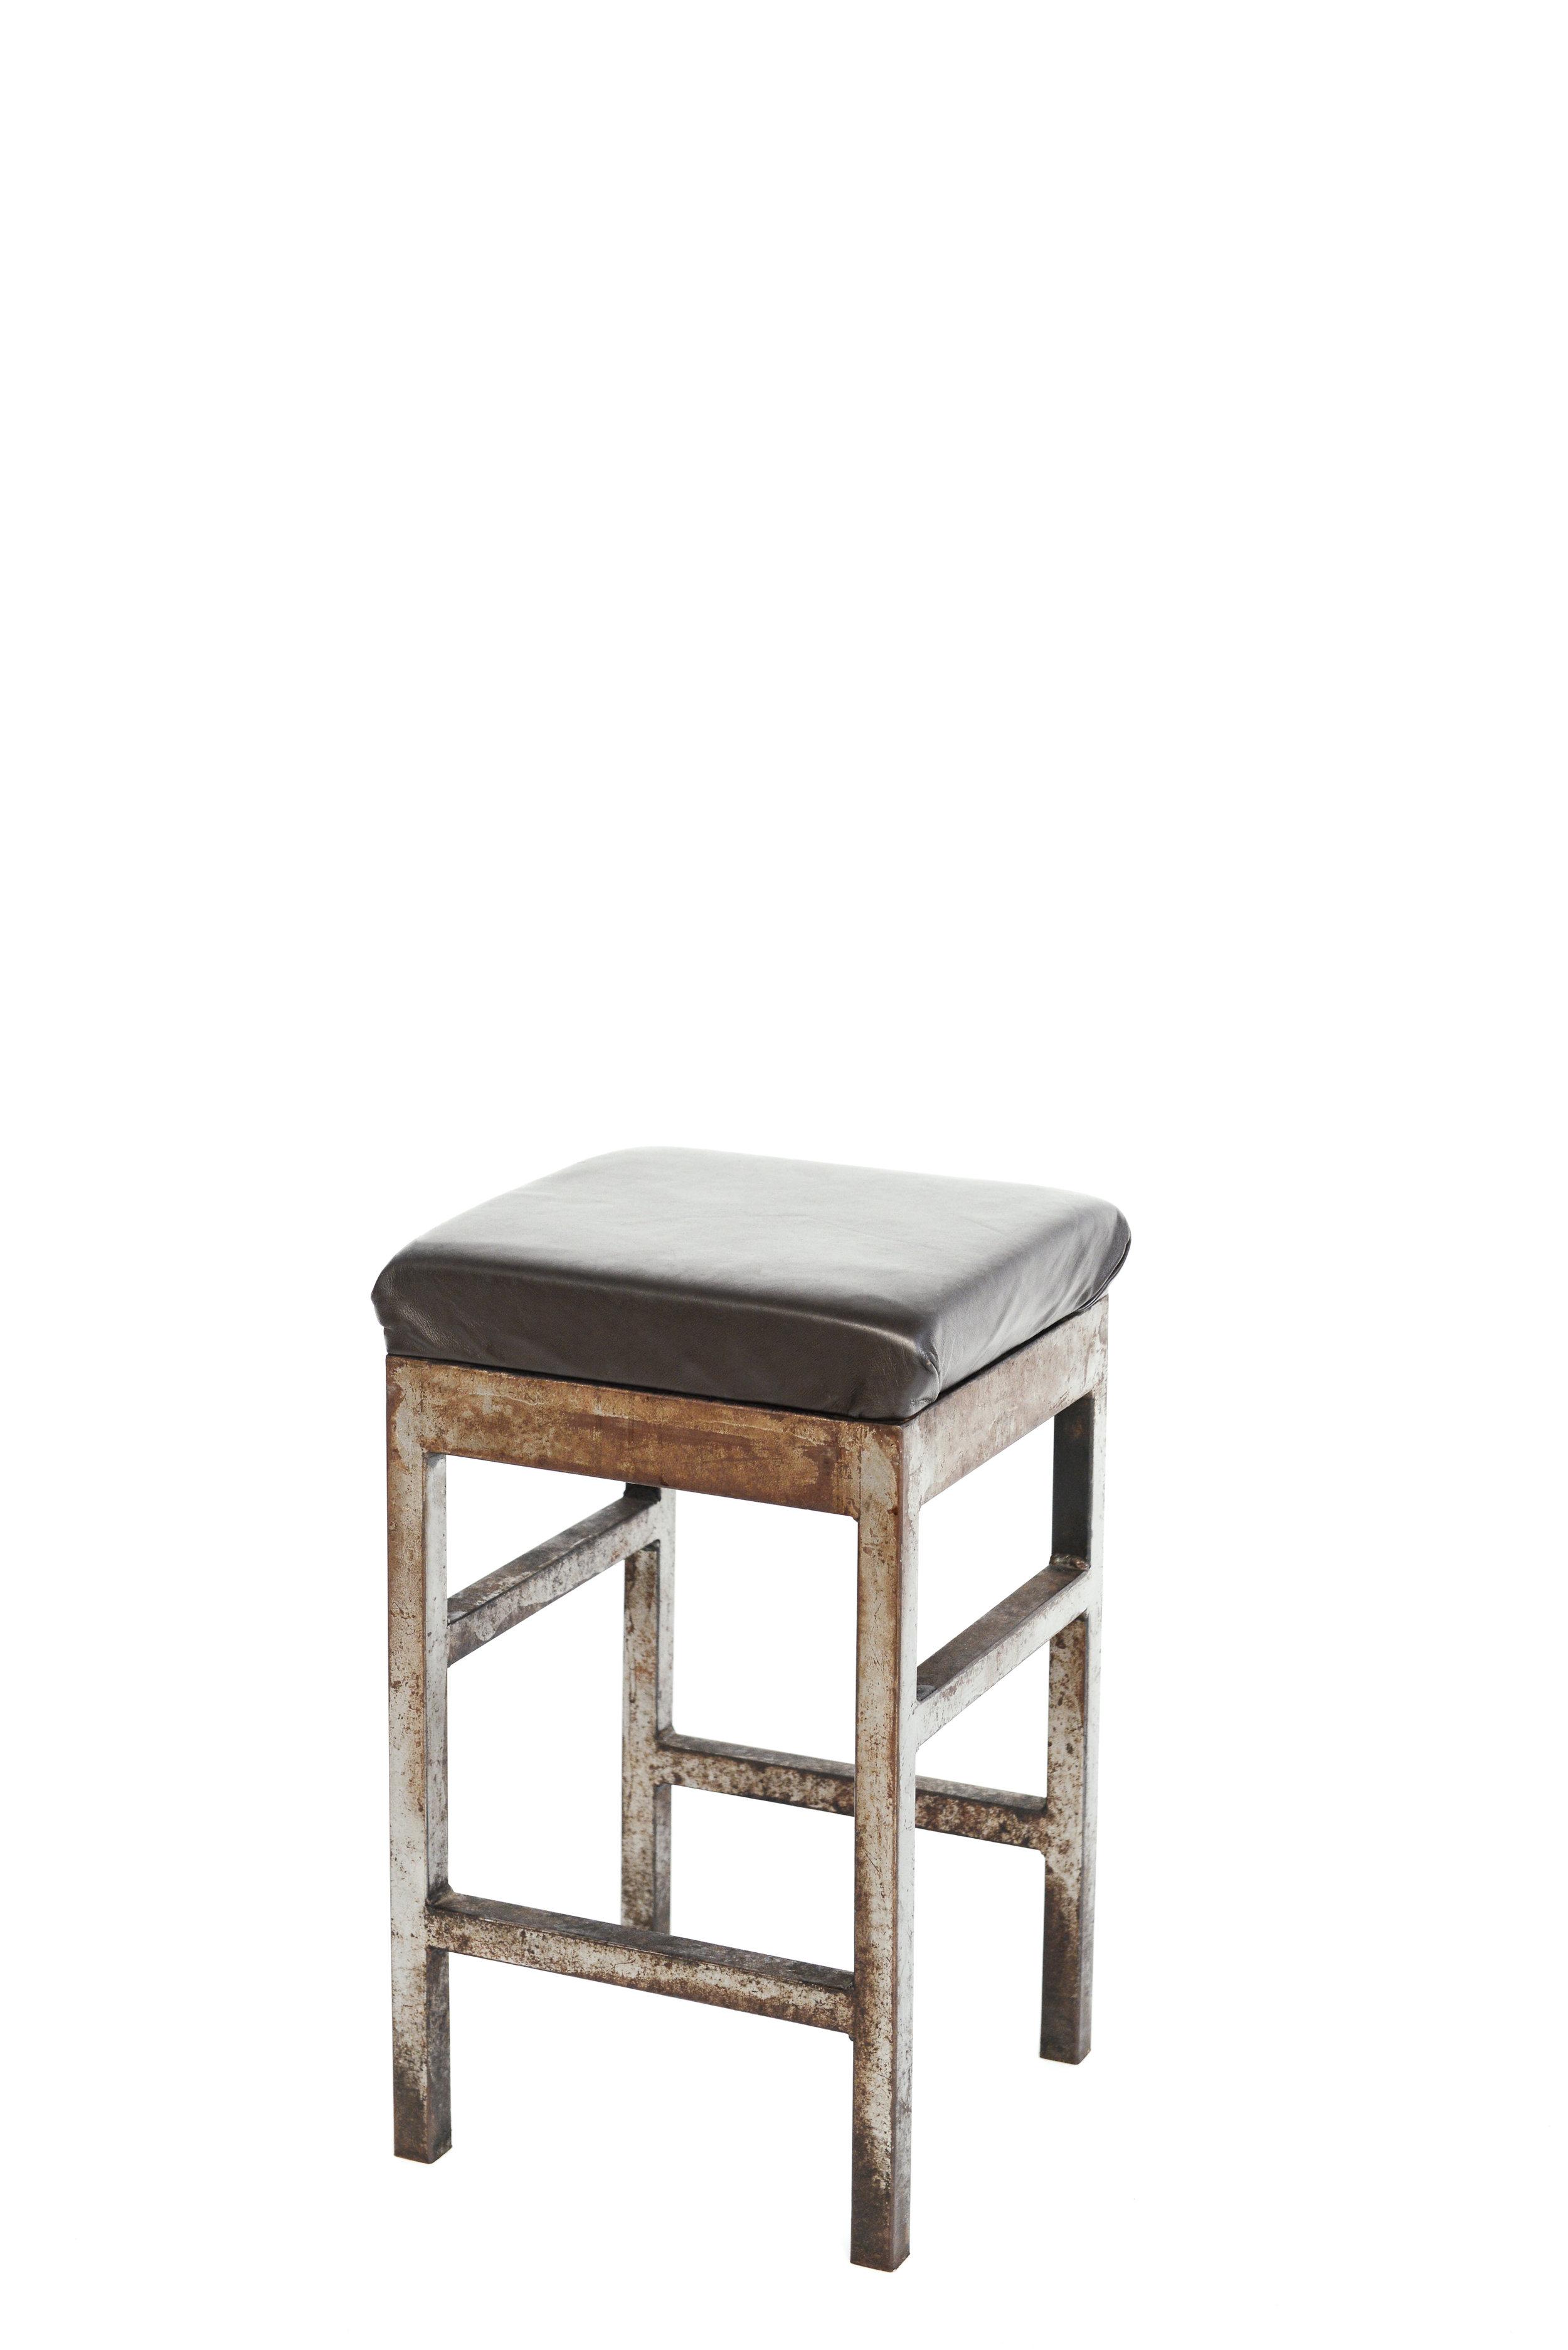 Vintage stools qty. 2